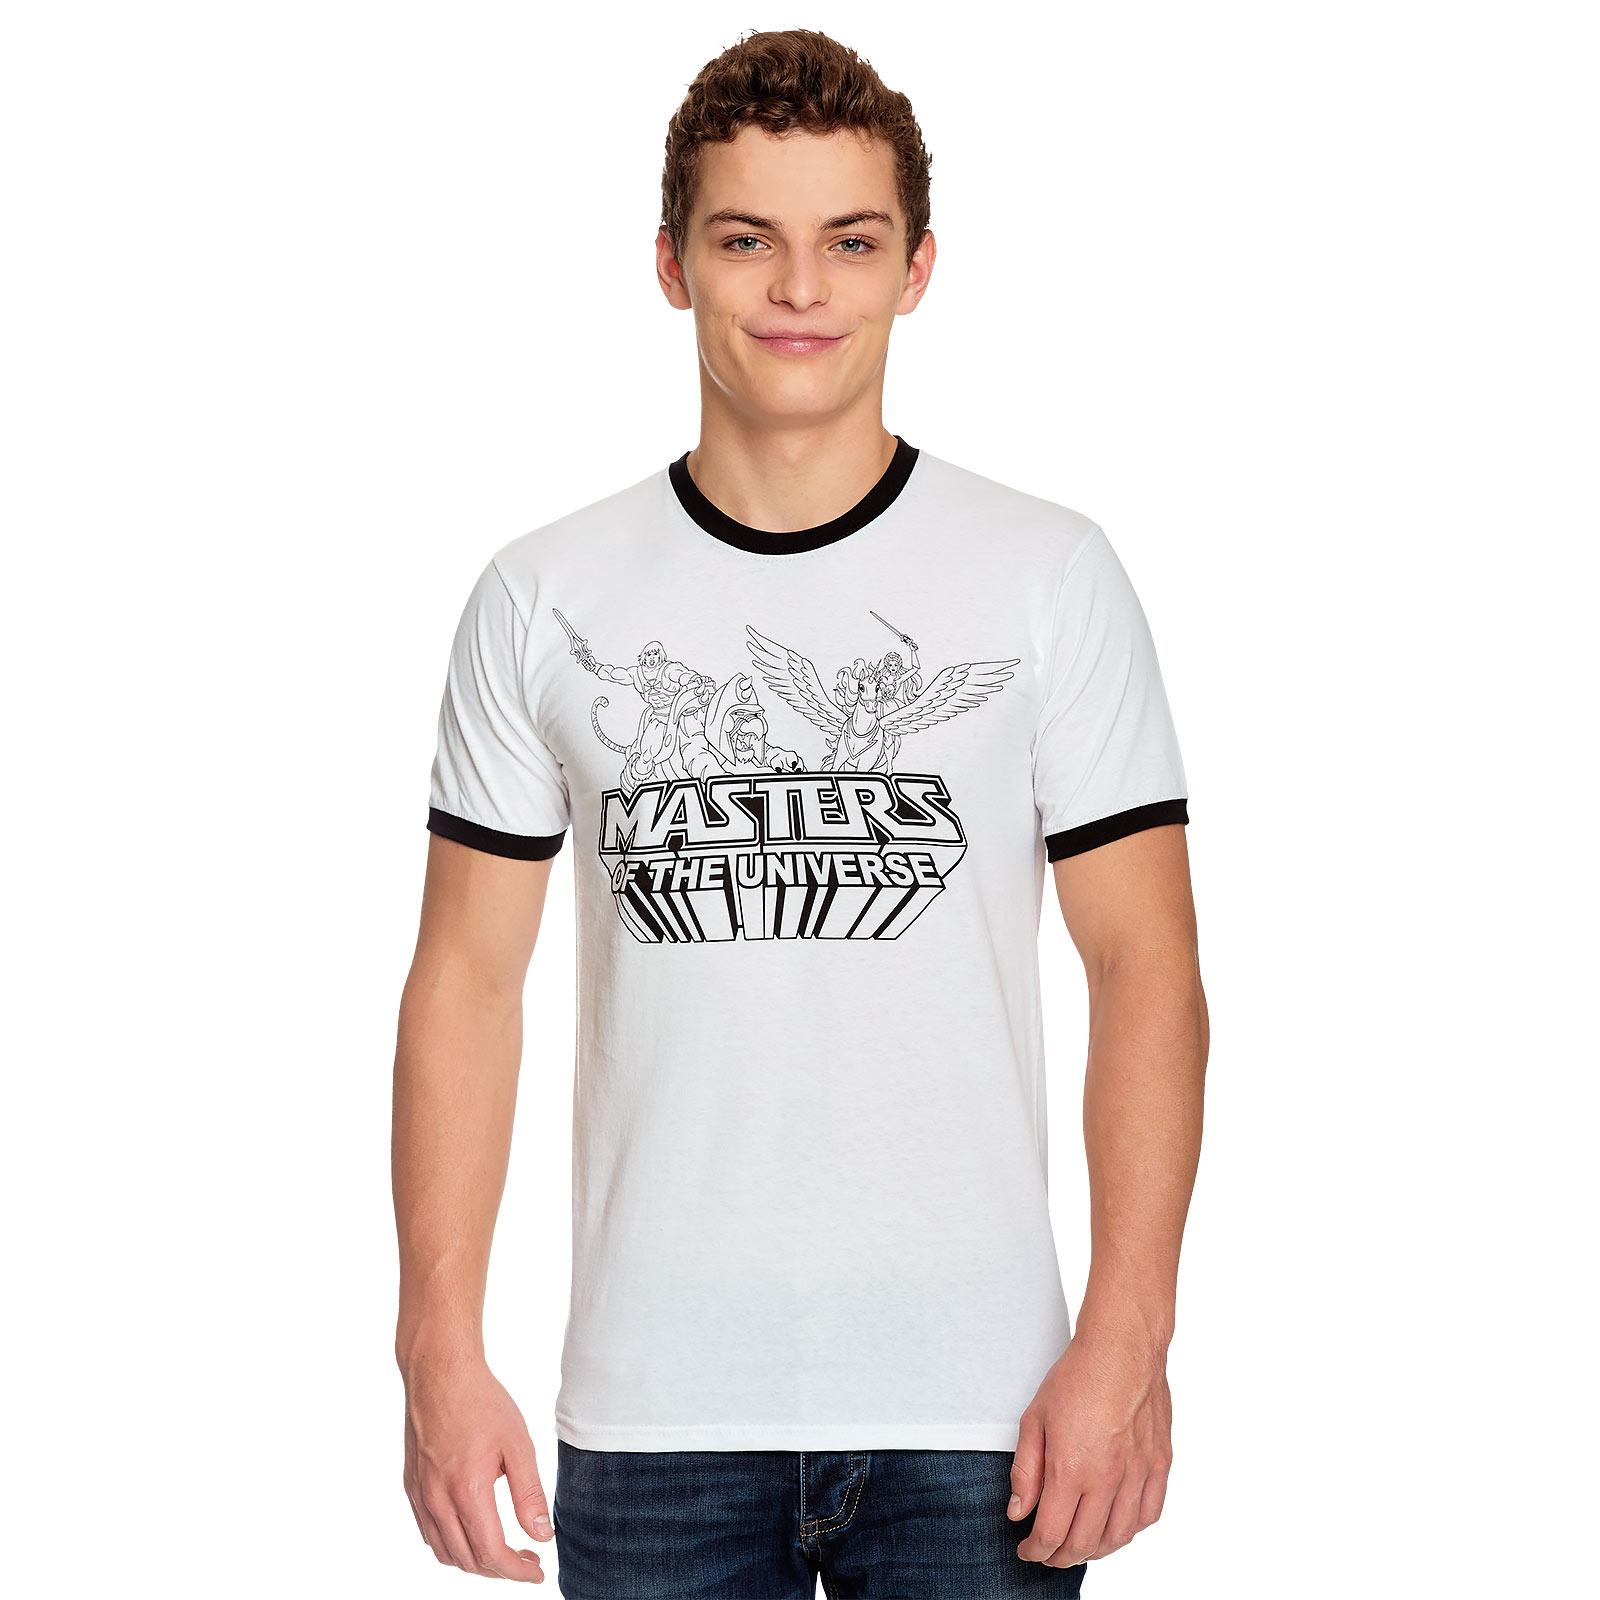 Masters of the Universe - He-Man & She-Ra T-Shirt